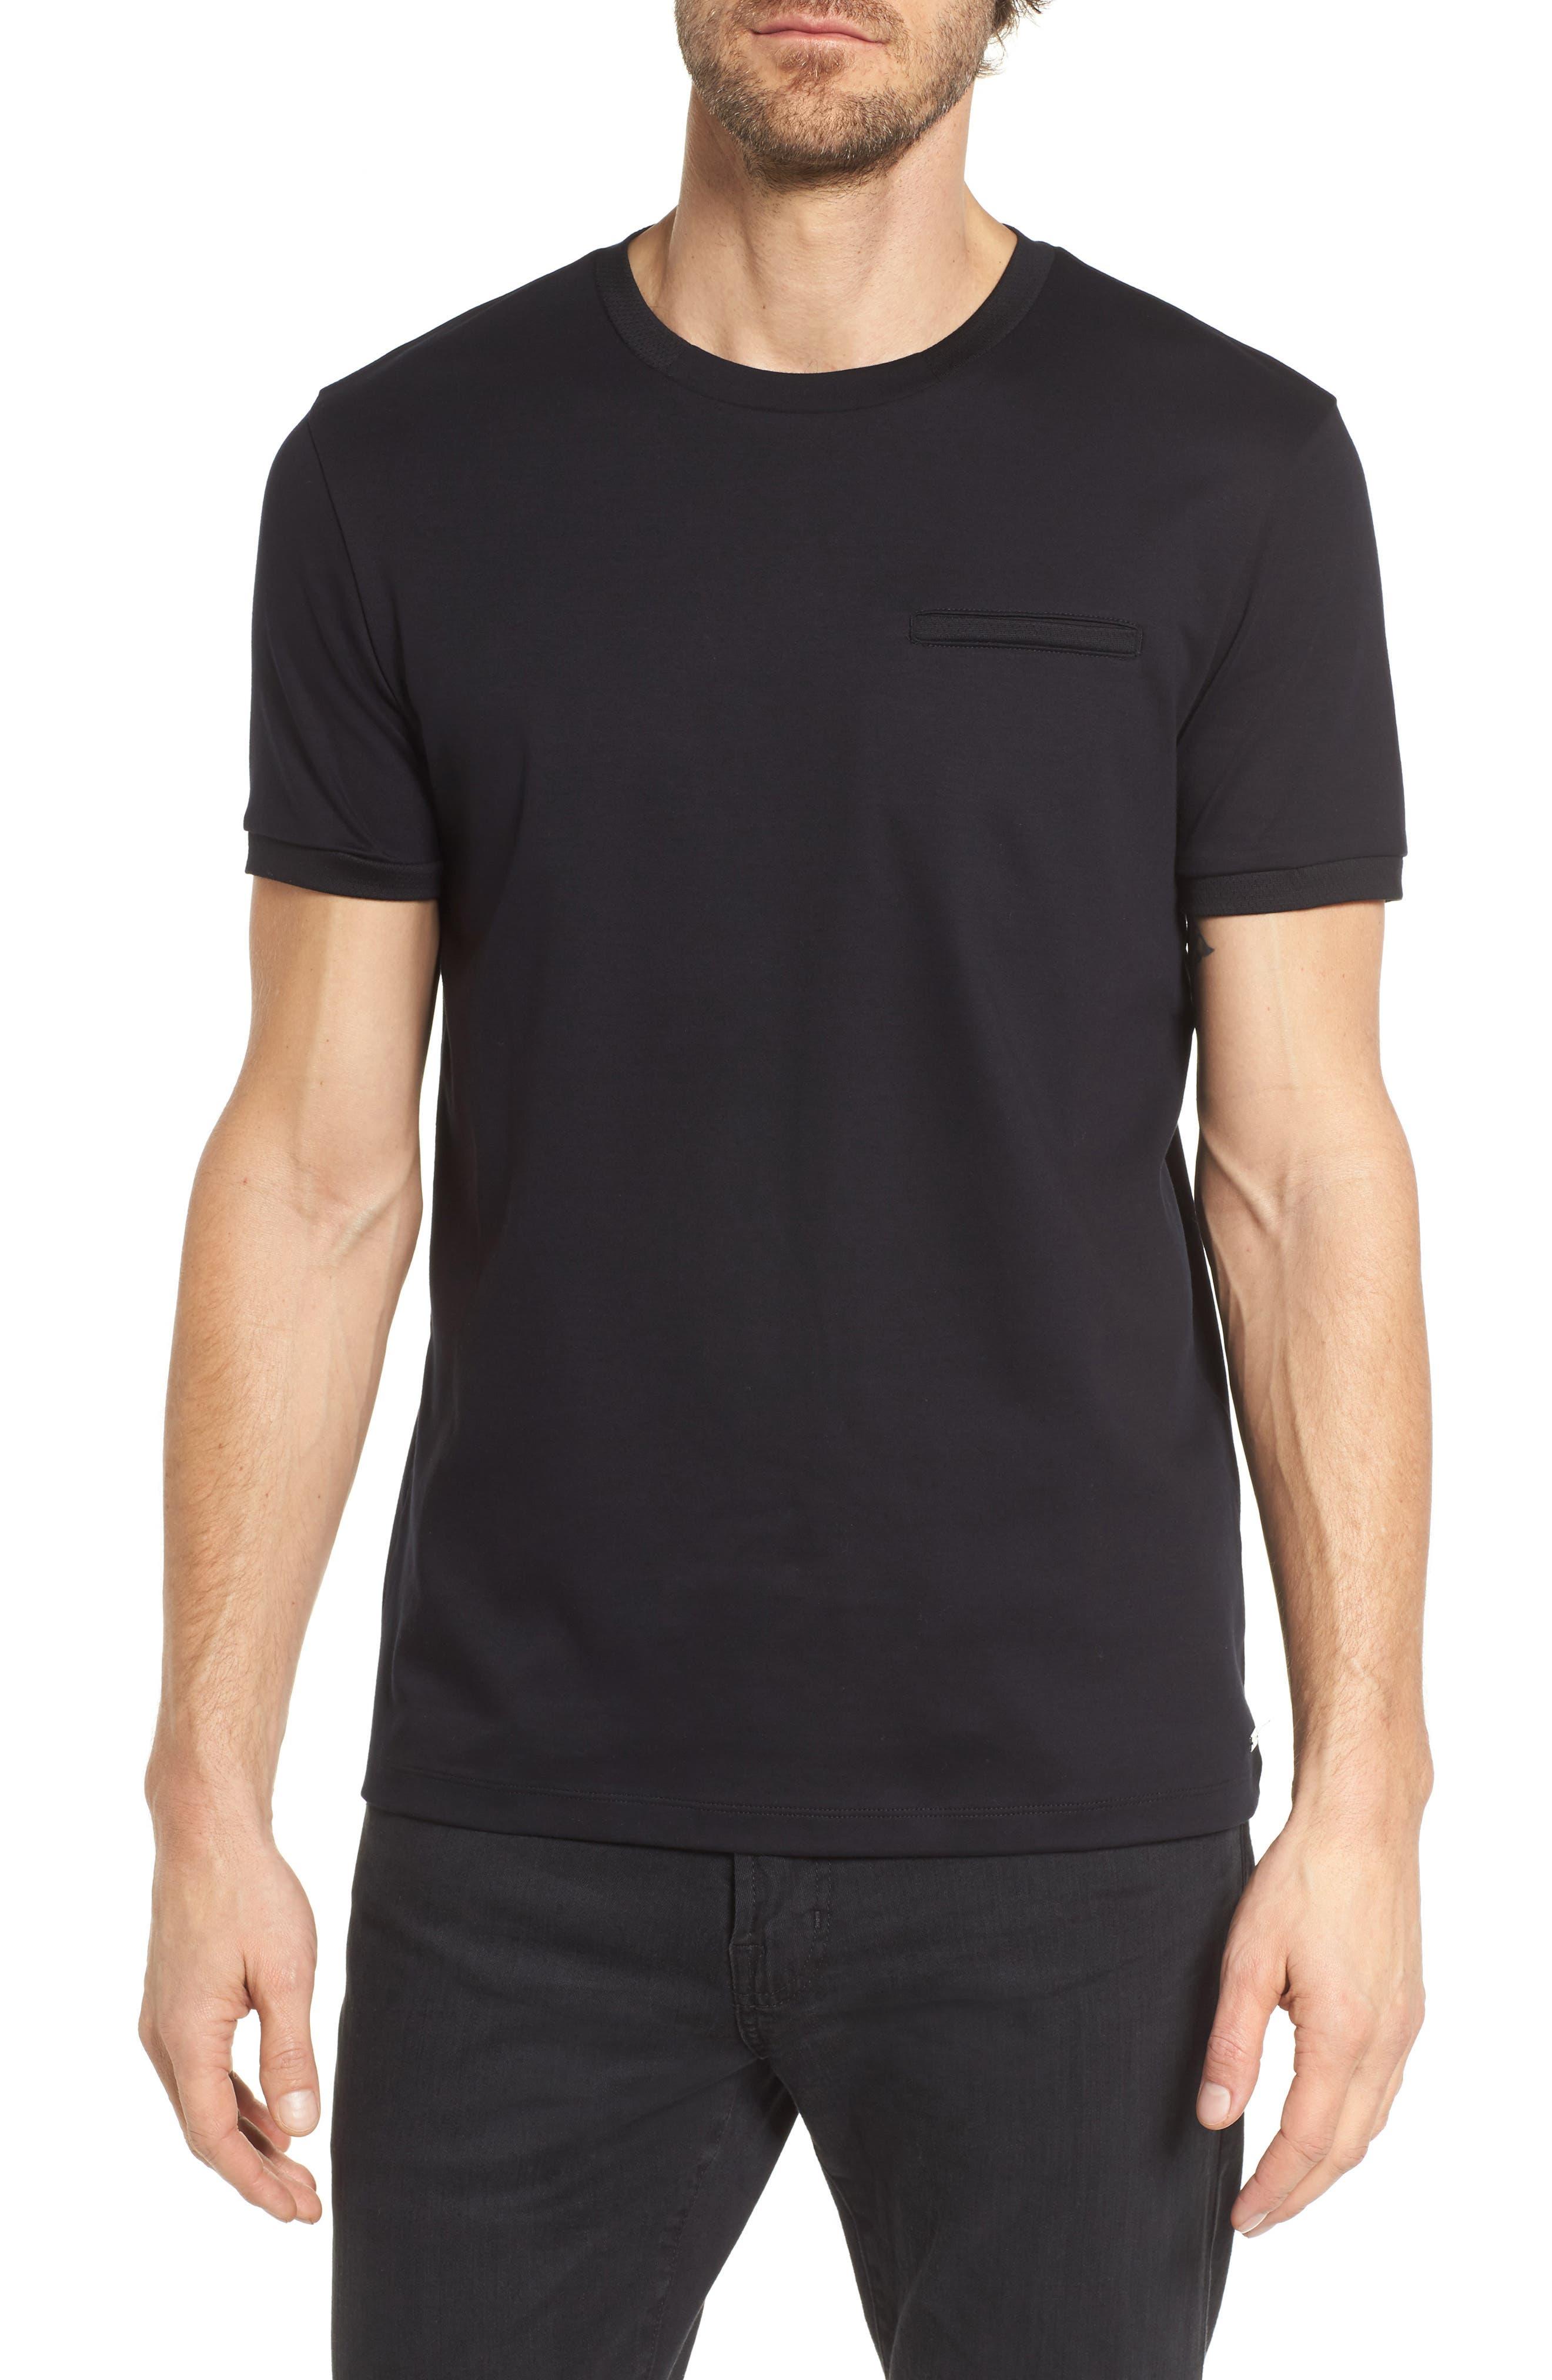 Tessler Mercedes Slim Fit Crewneck T-Shirt,                             Main thumbnail 1, color,                             Black